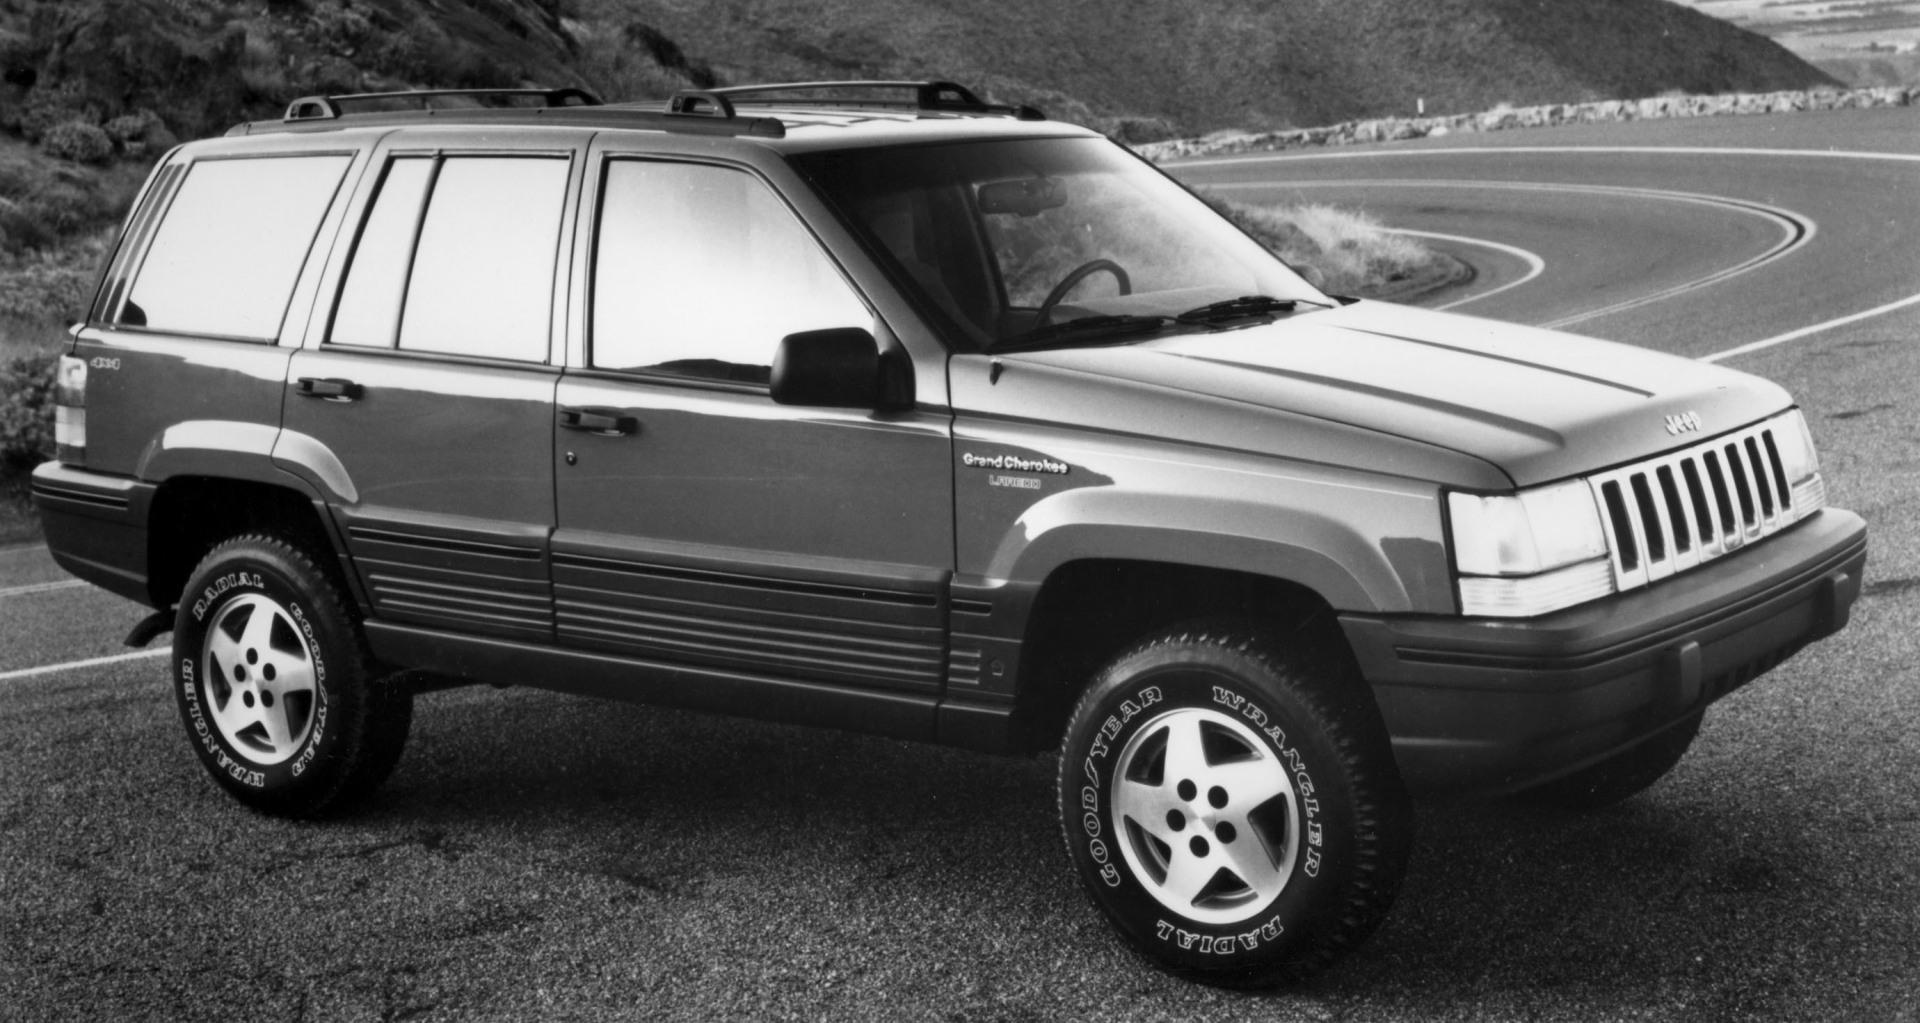 1997 jeep cherokee. Black Bedroom Furniture Sets. Home Design Ideas